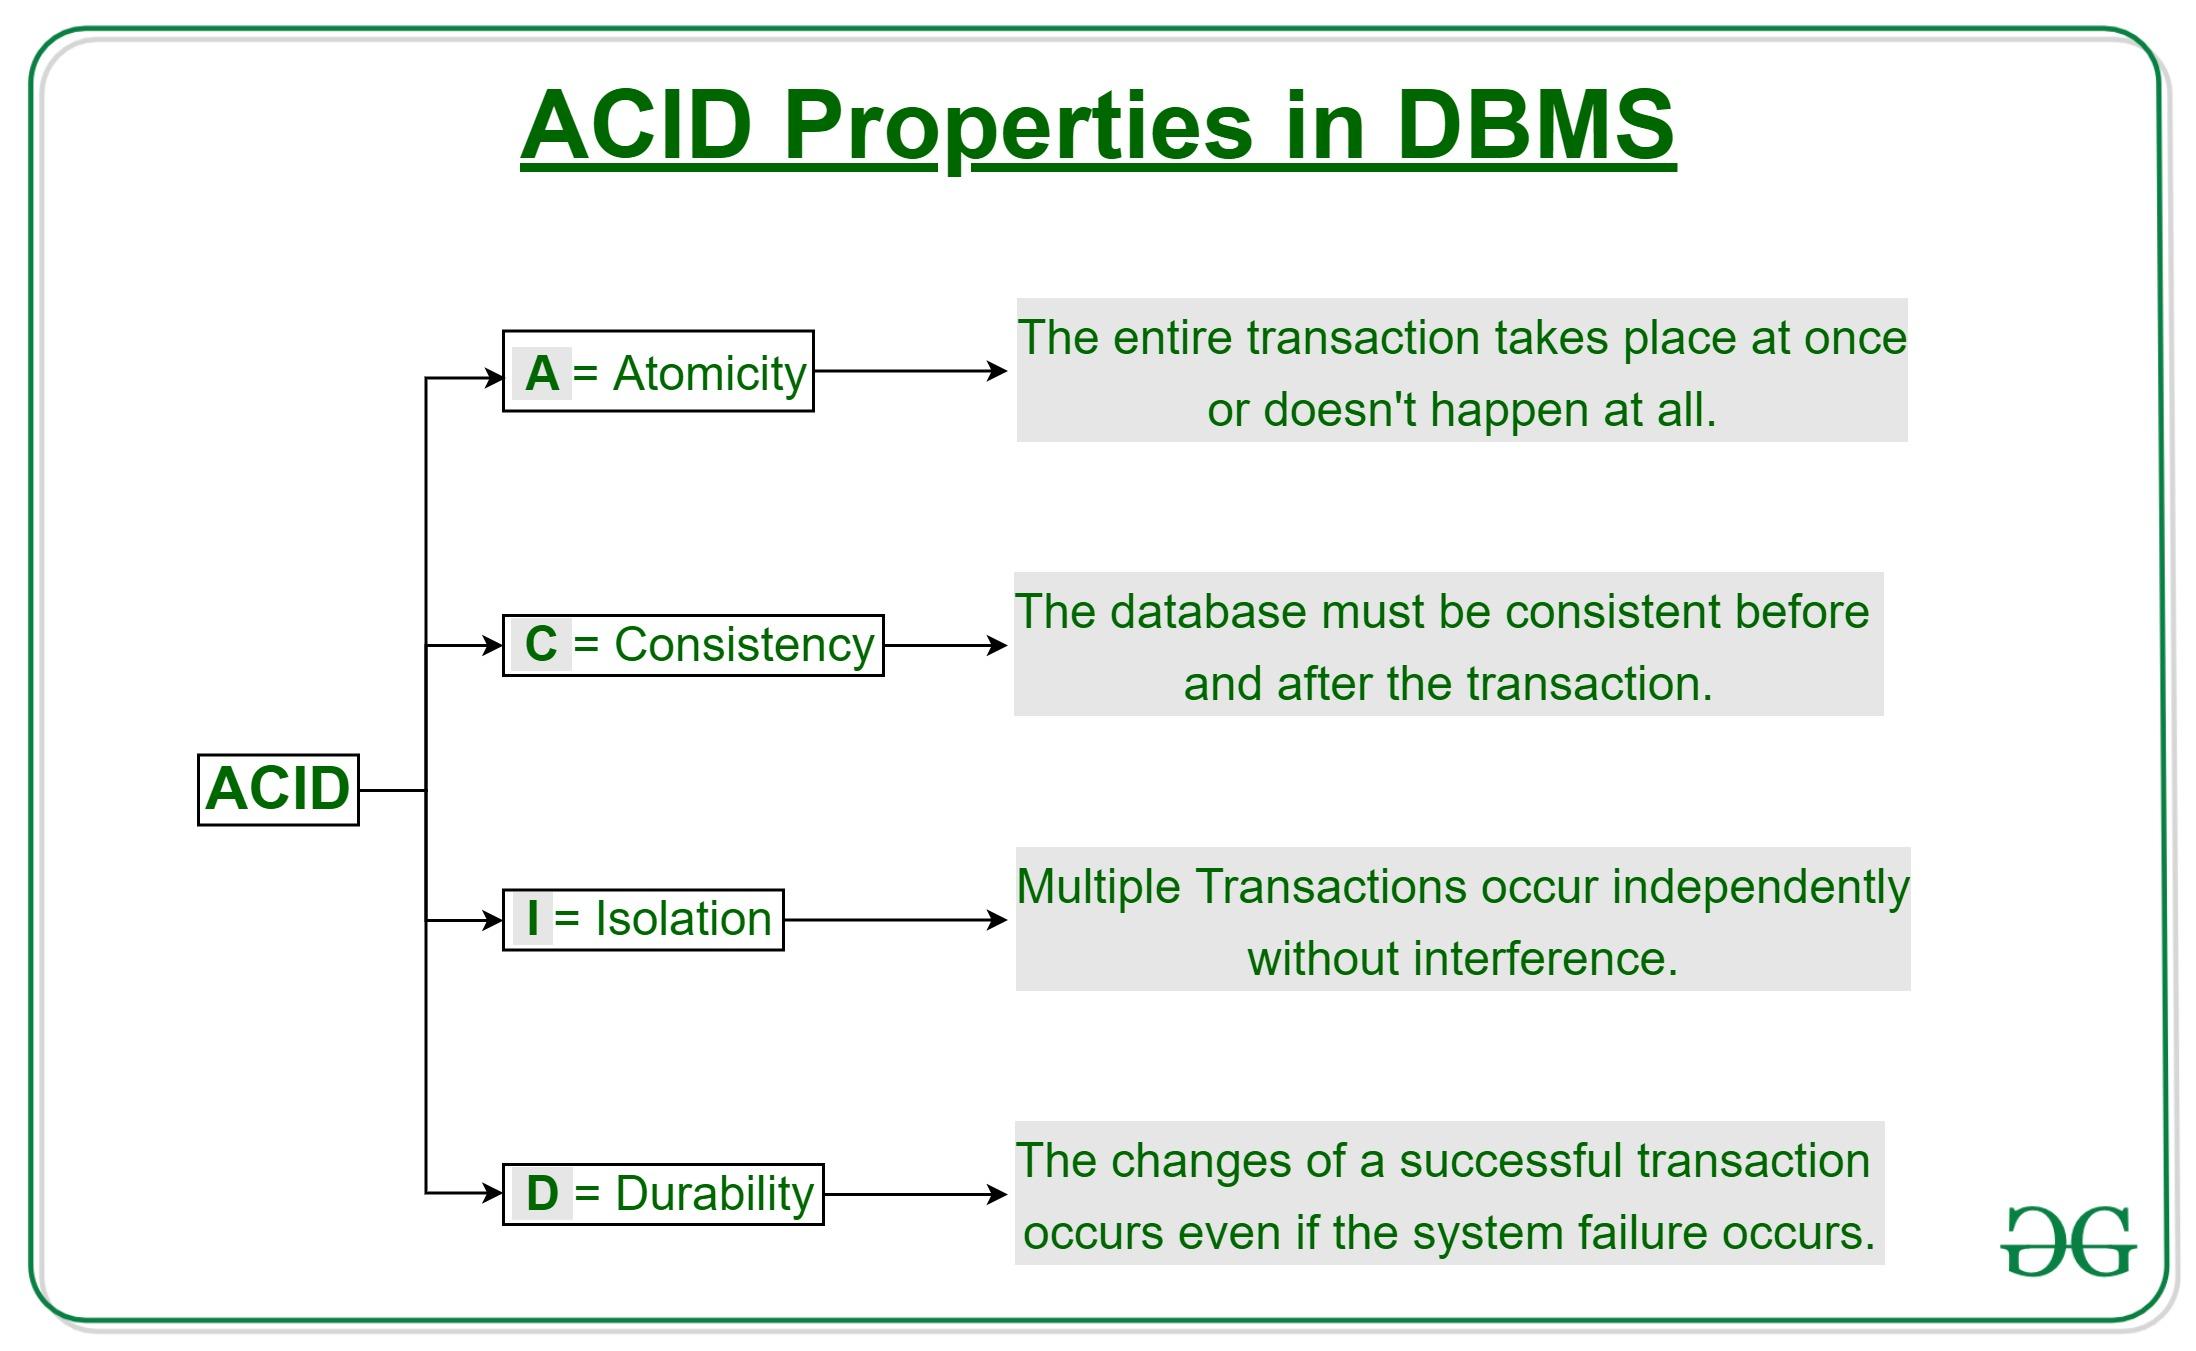 ACID properties in RDBMS